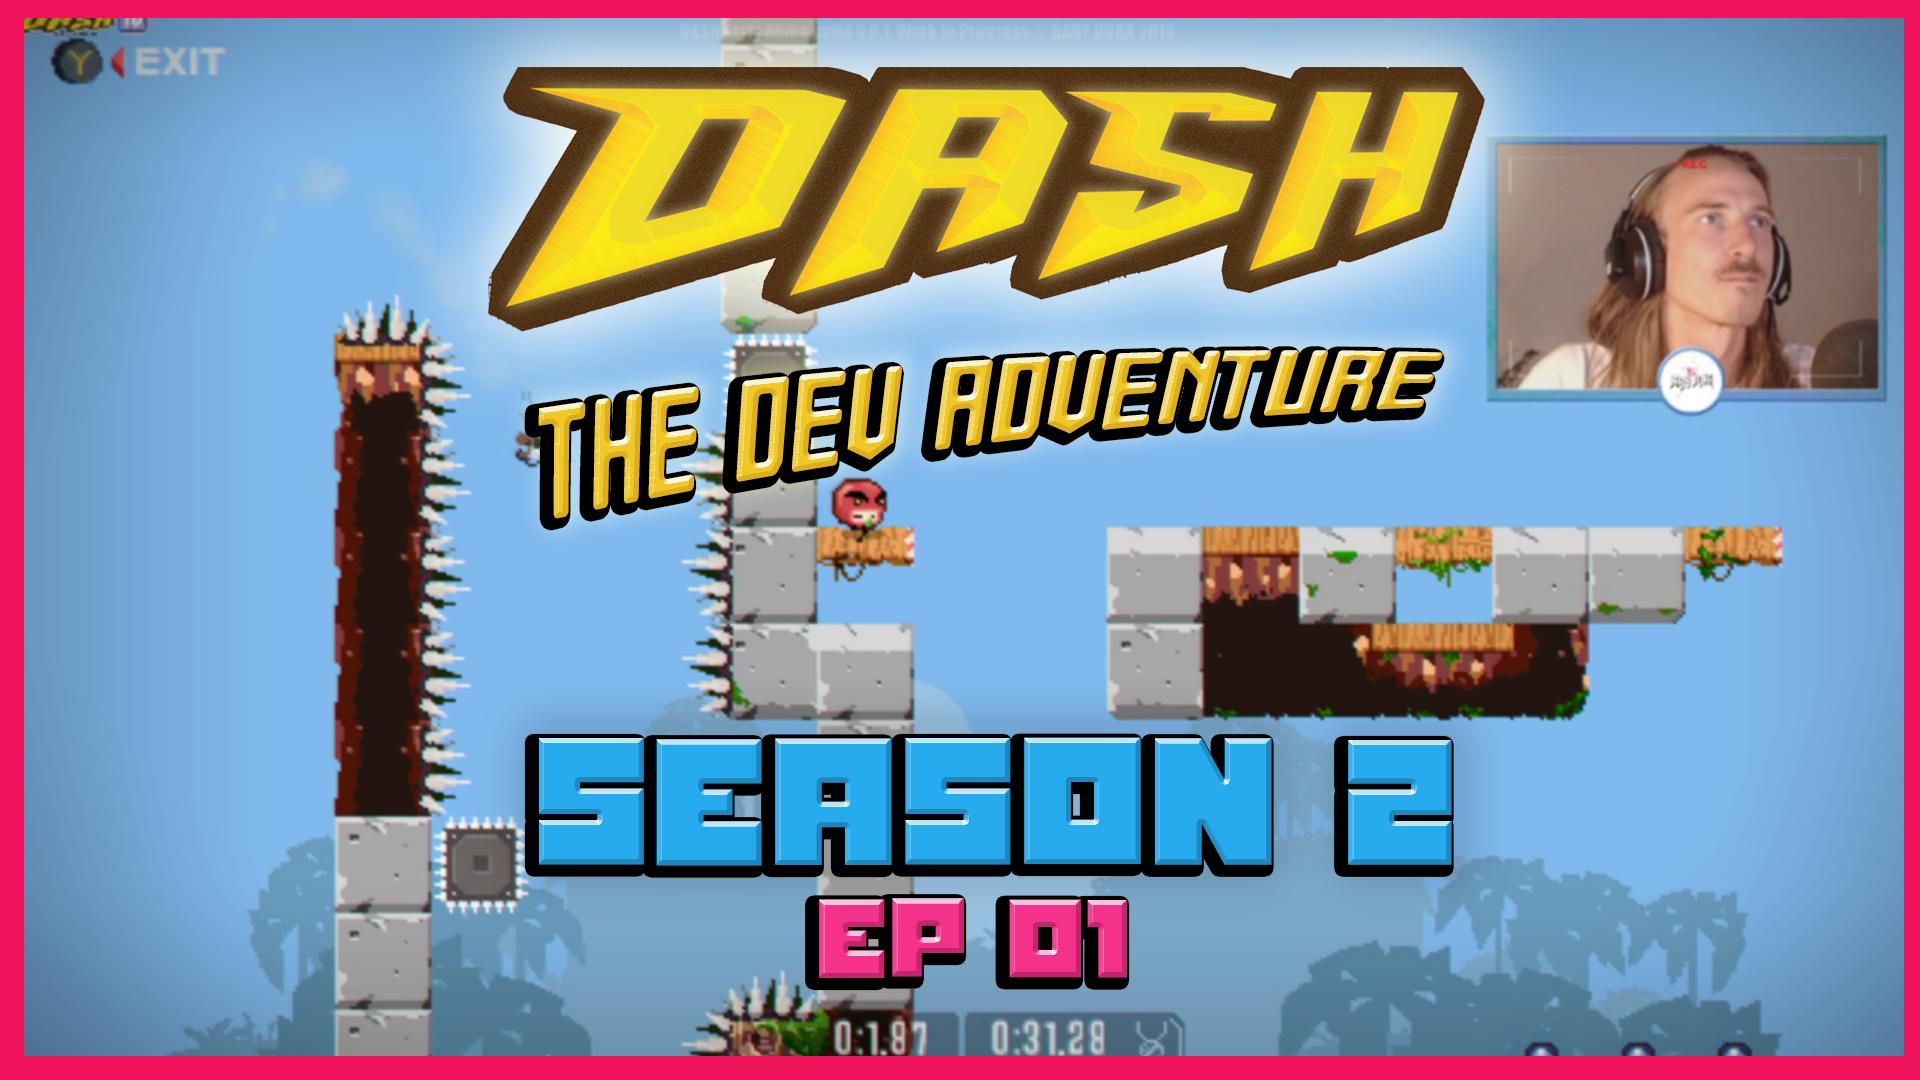 DASH Season 2 ep 01